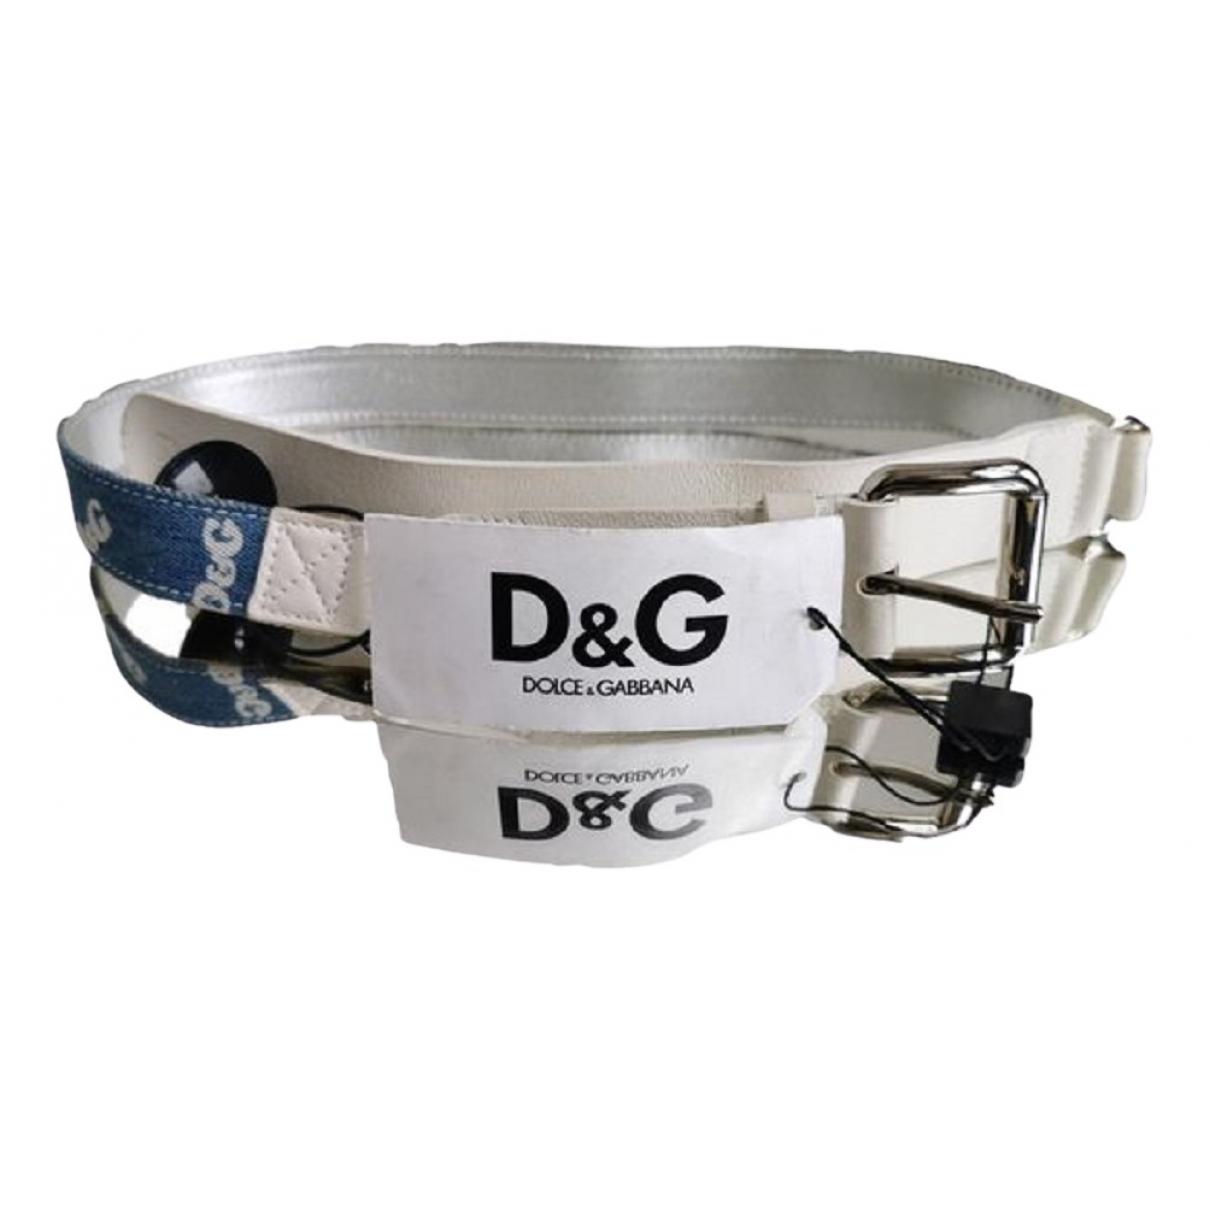 D&g N Blue Leather belt for Women 85 cm